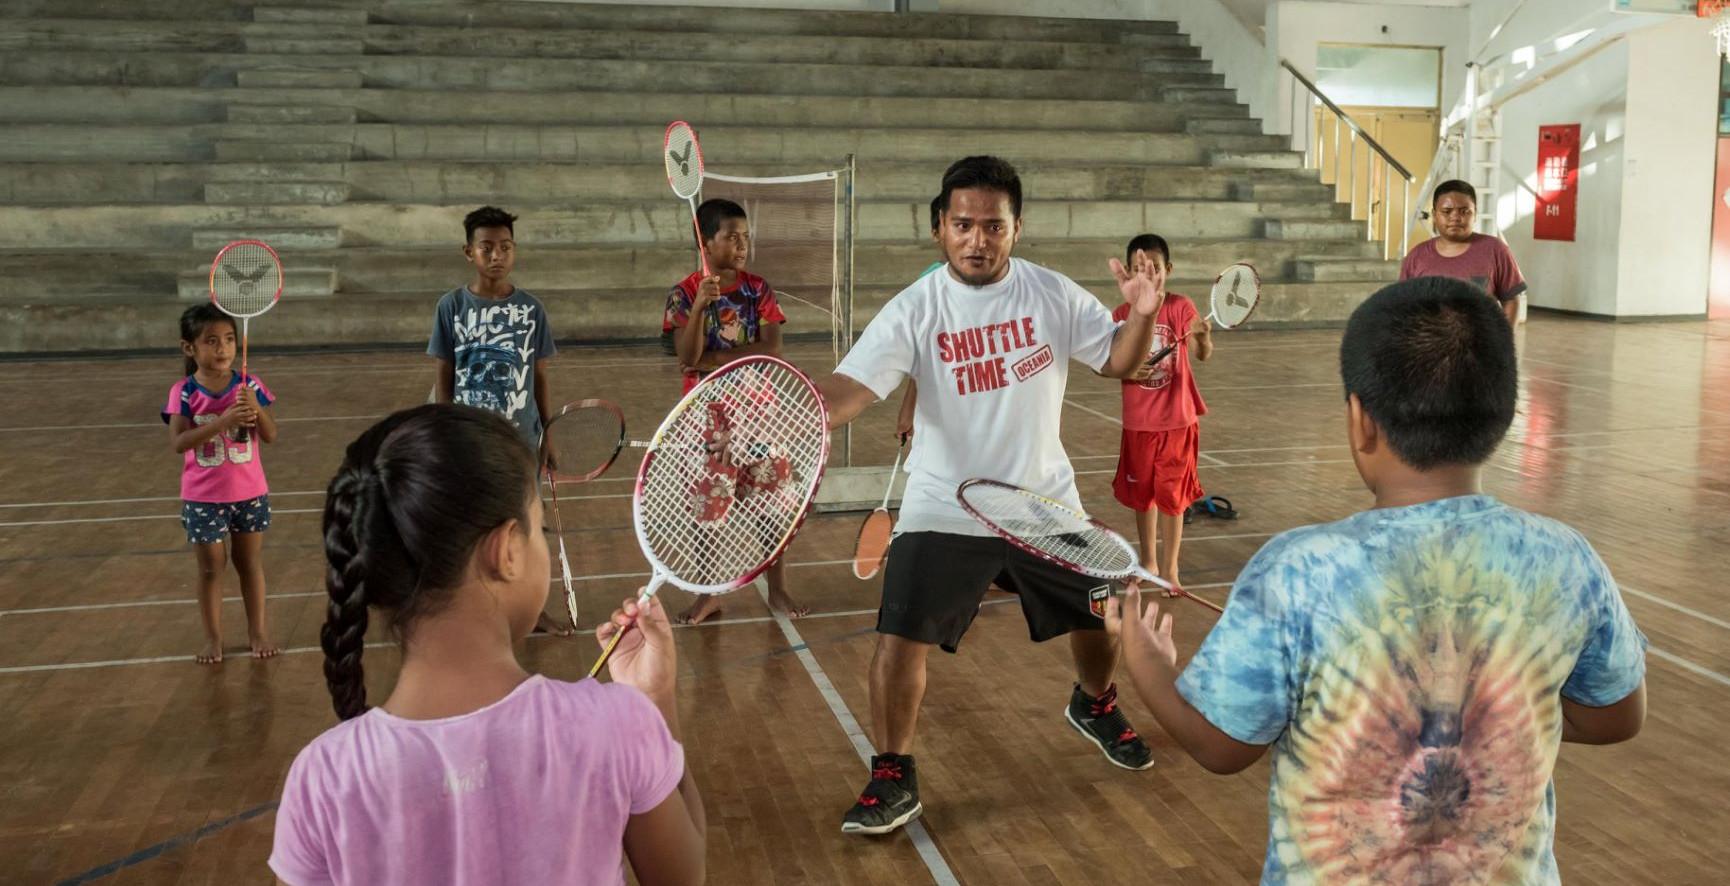 Kiribati, the Only Nation to Play Badminton Across All Hemispheres